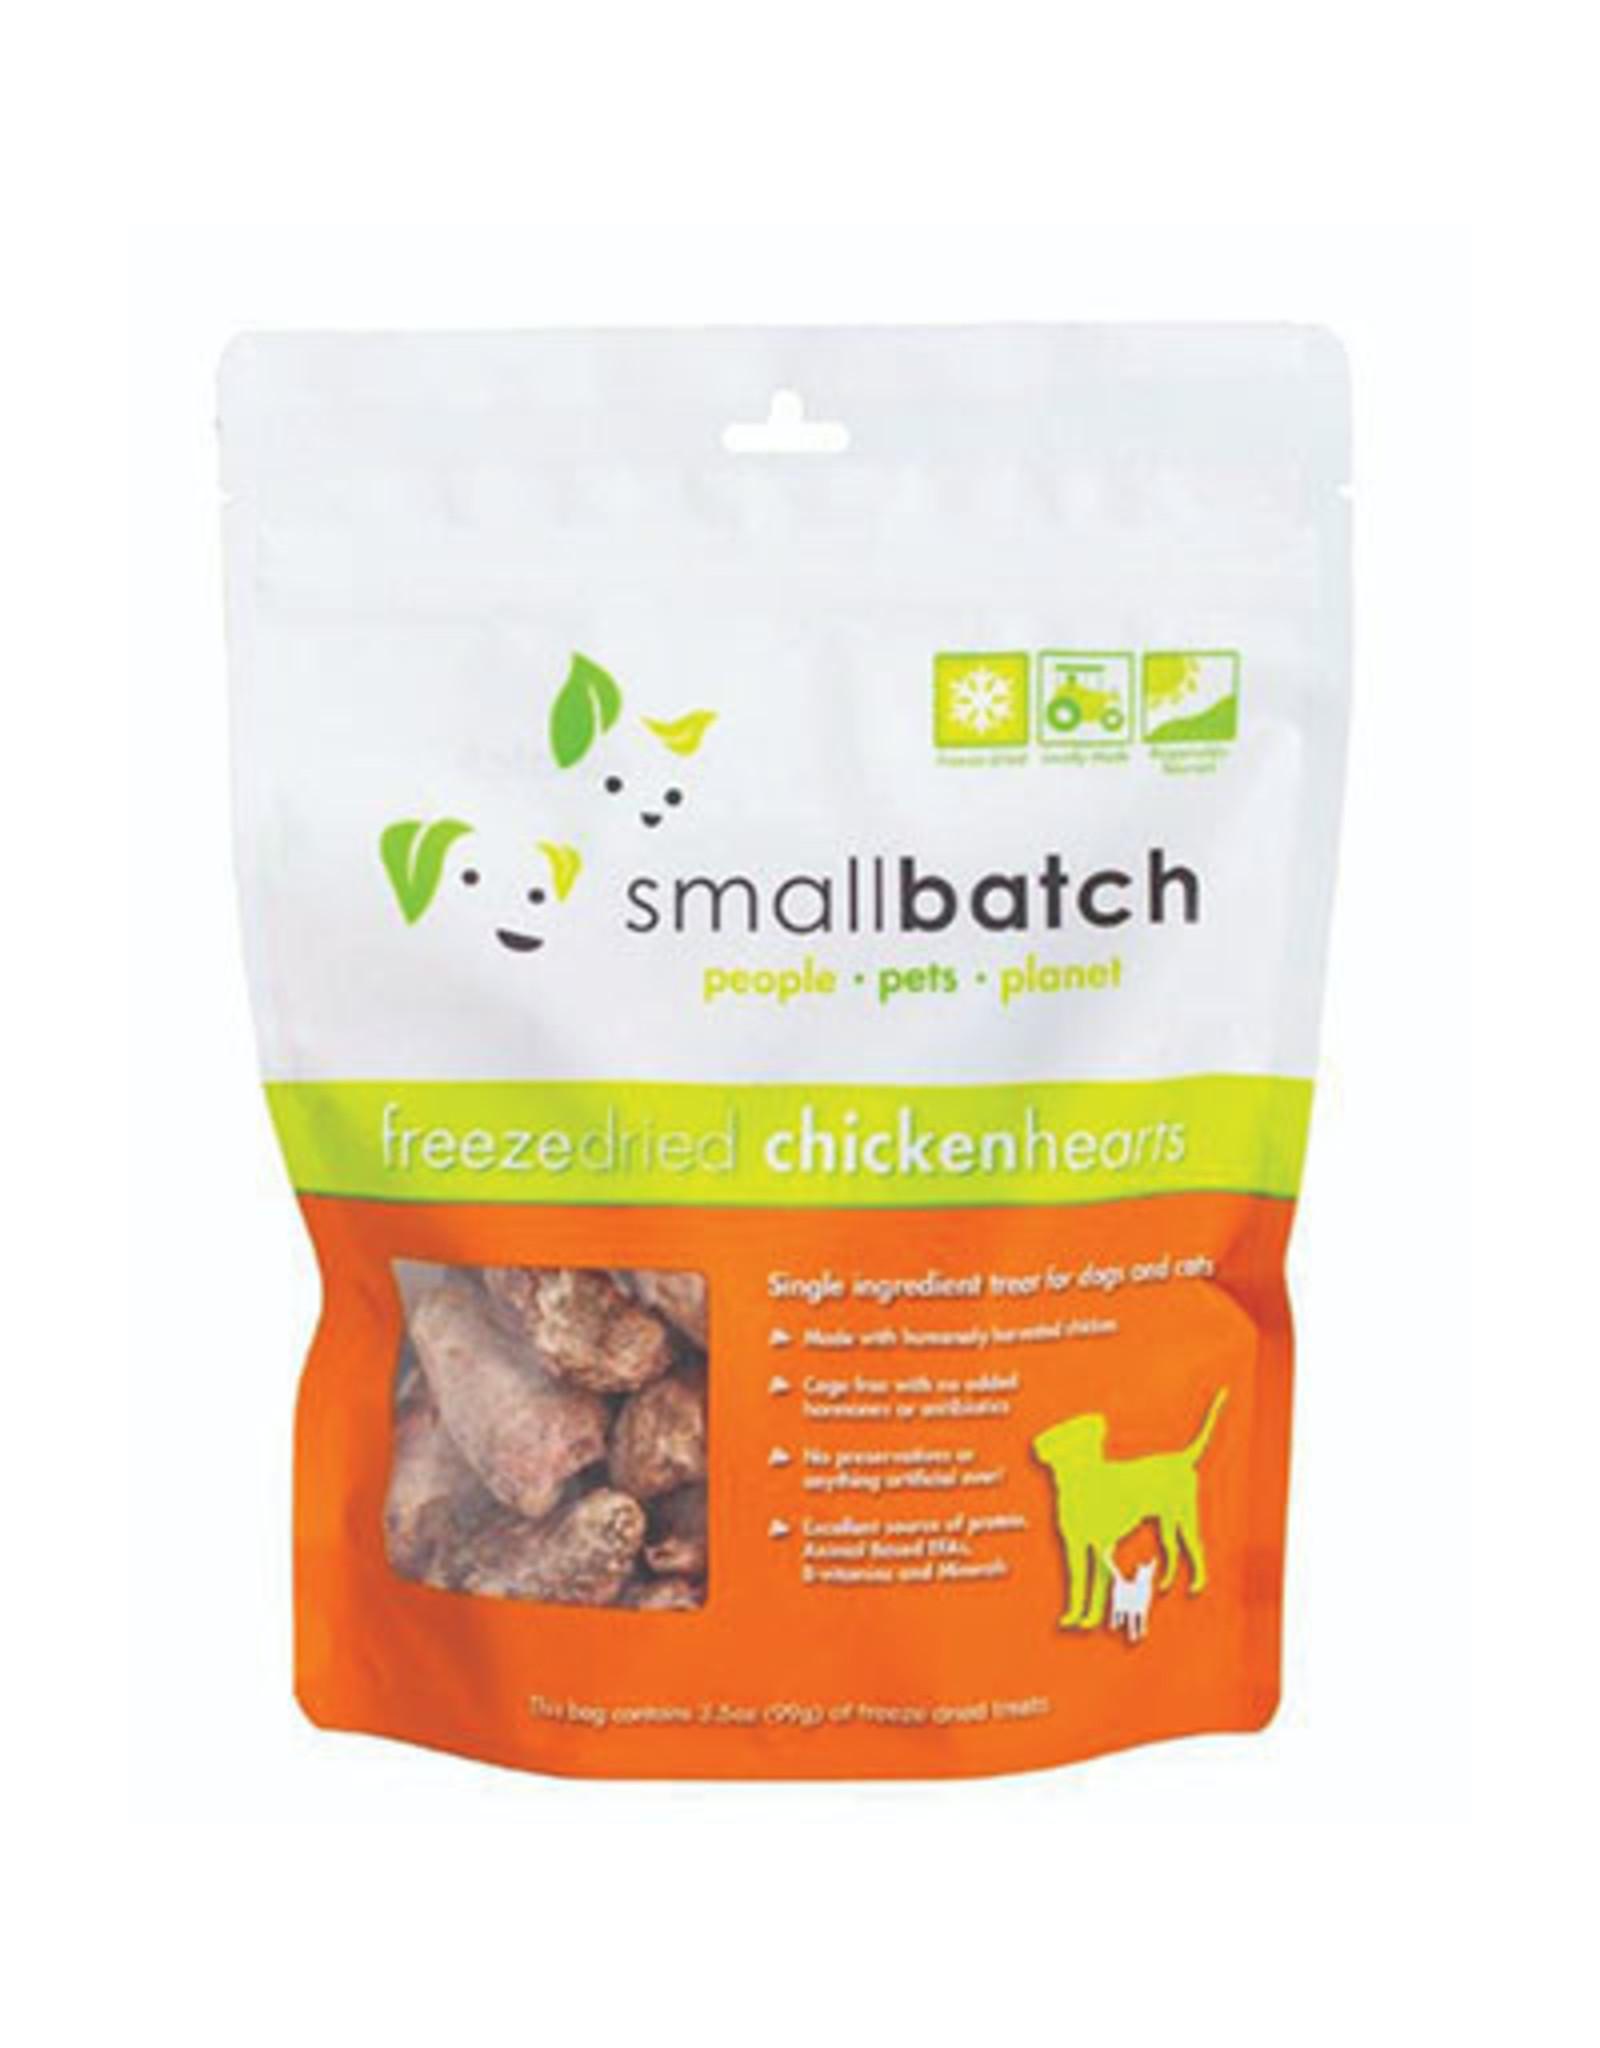 Smallbatch SMALLBATCH FREEZE DRIED CHICKEN HEARTS 3.5OZ